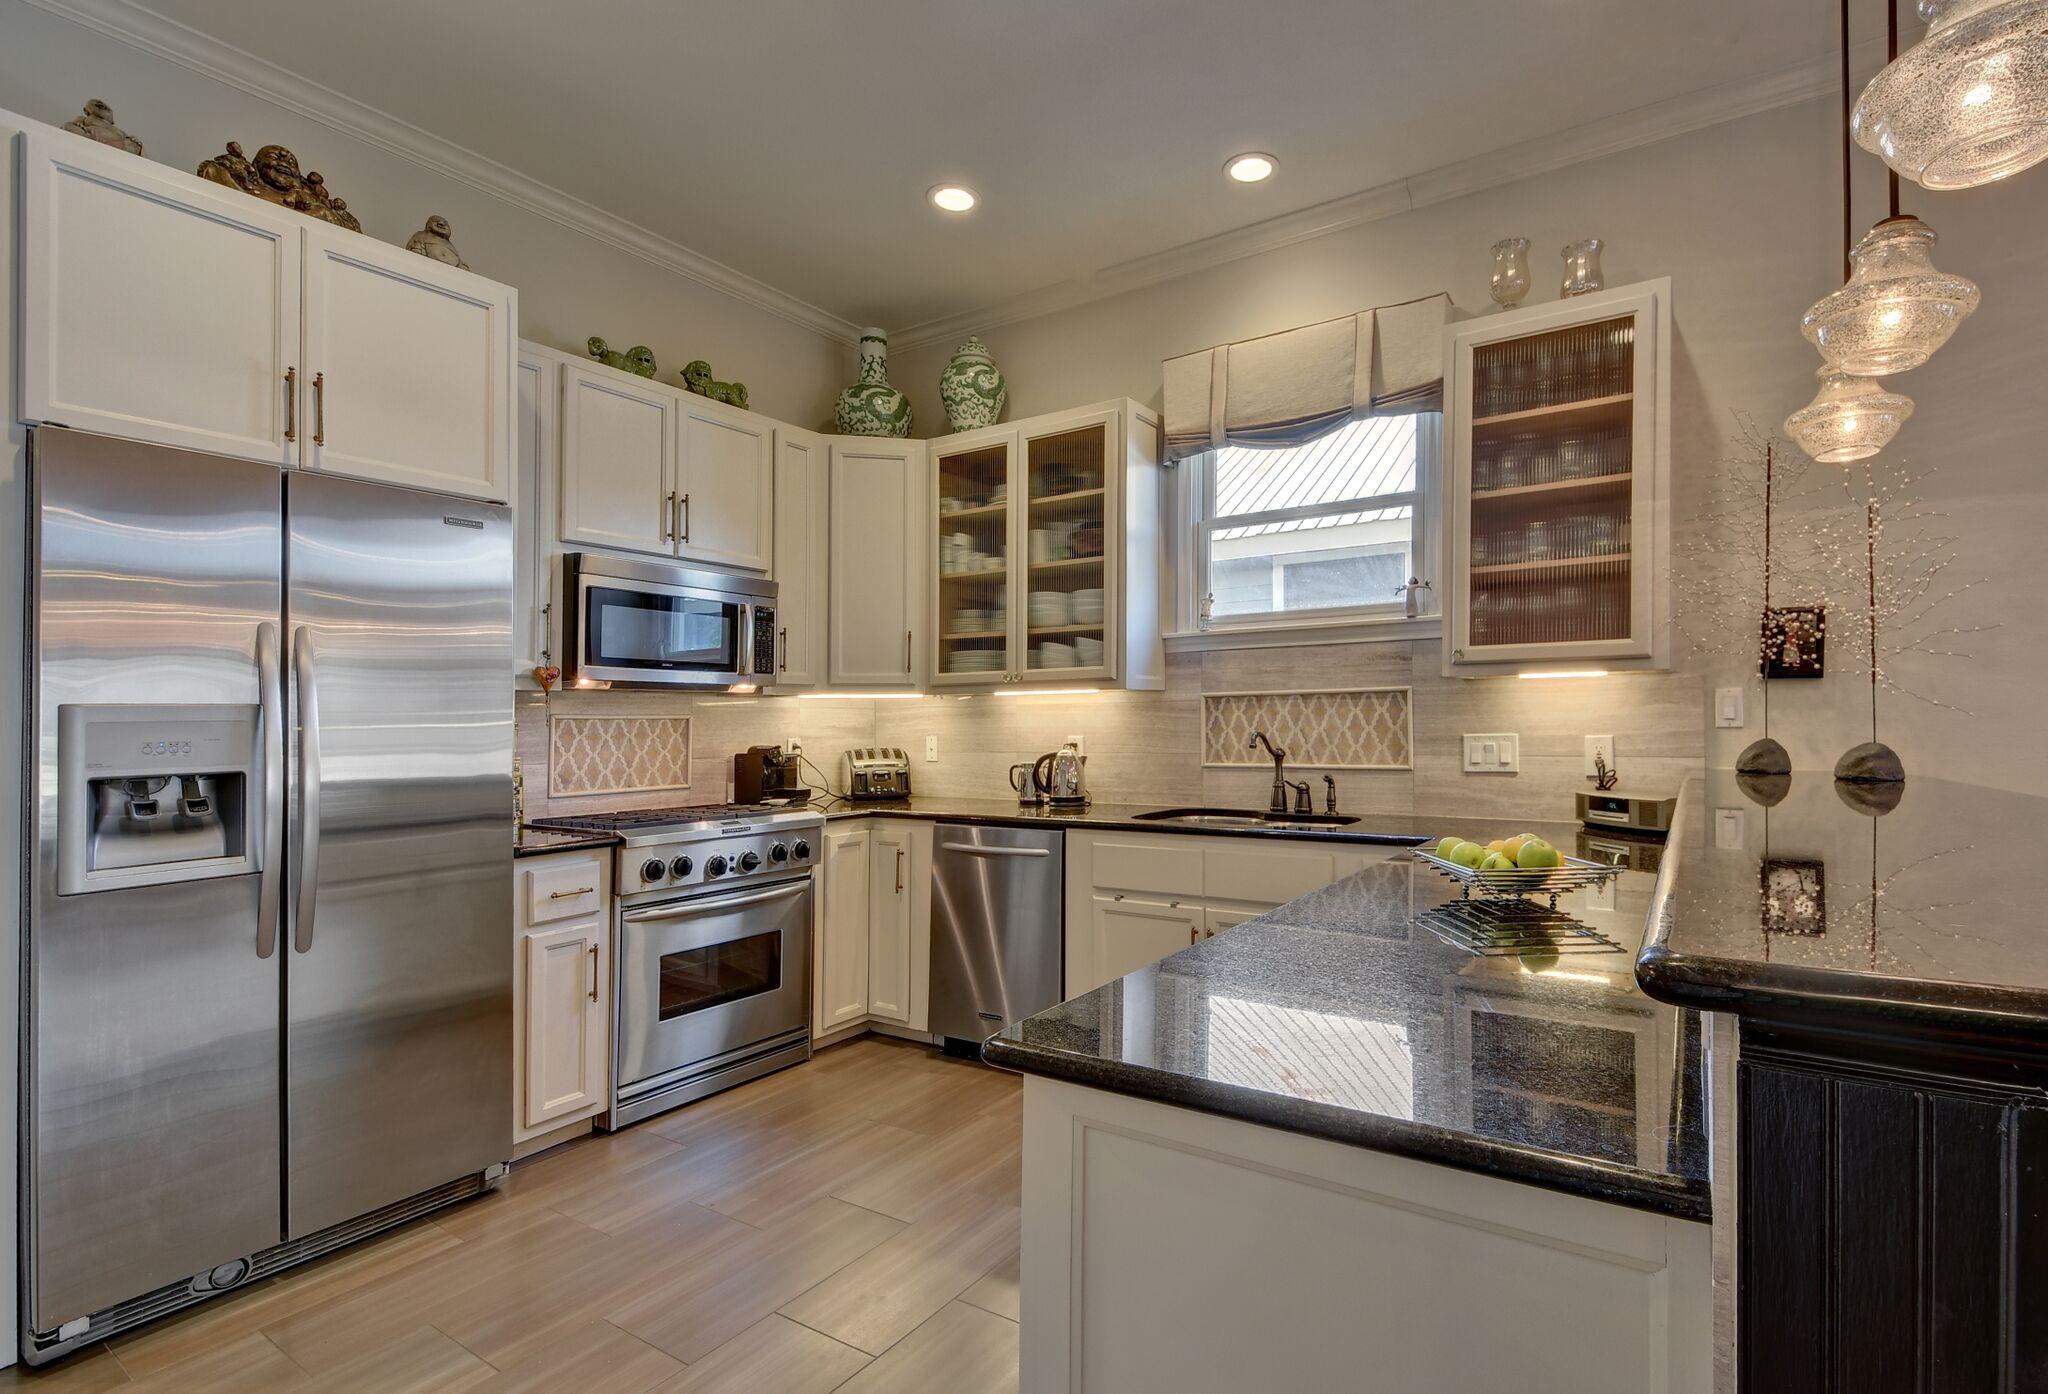 White kitchen with decorative backsplash